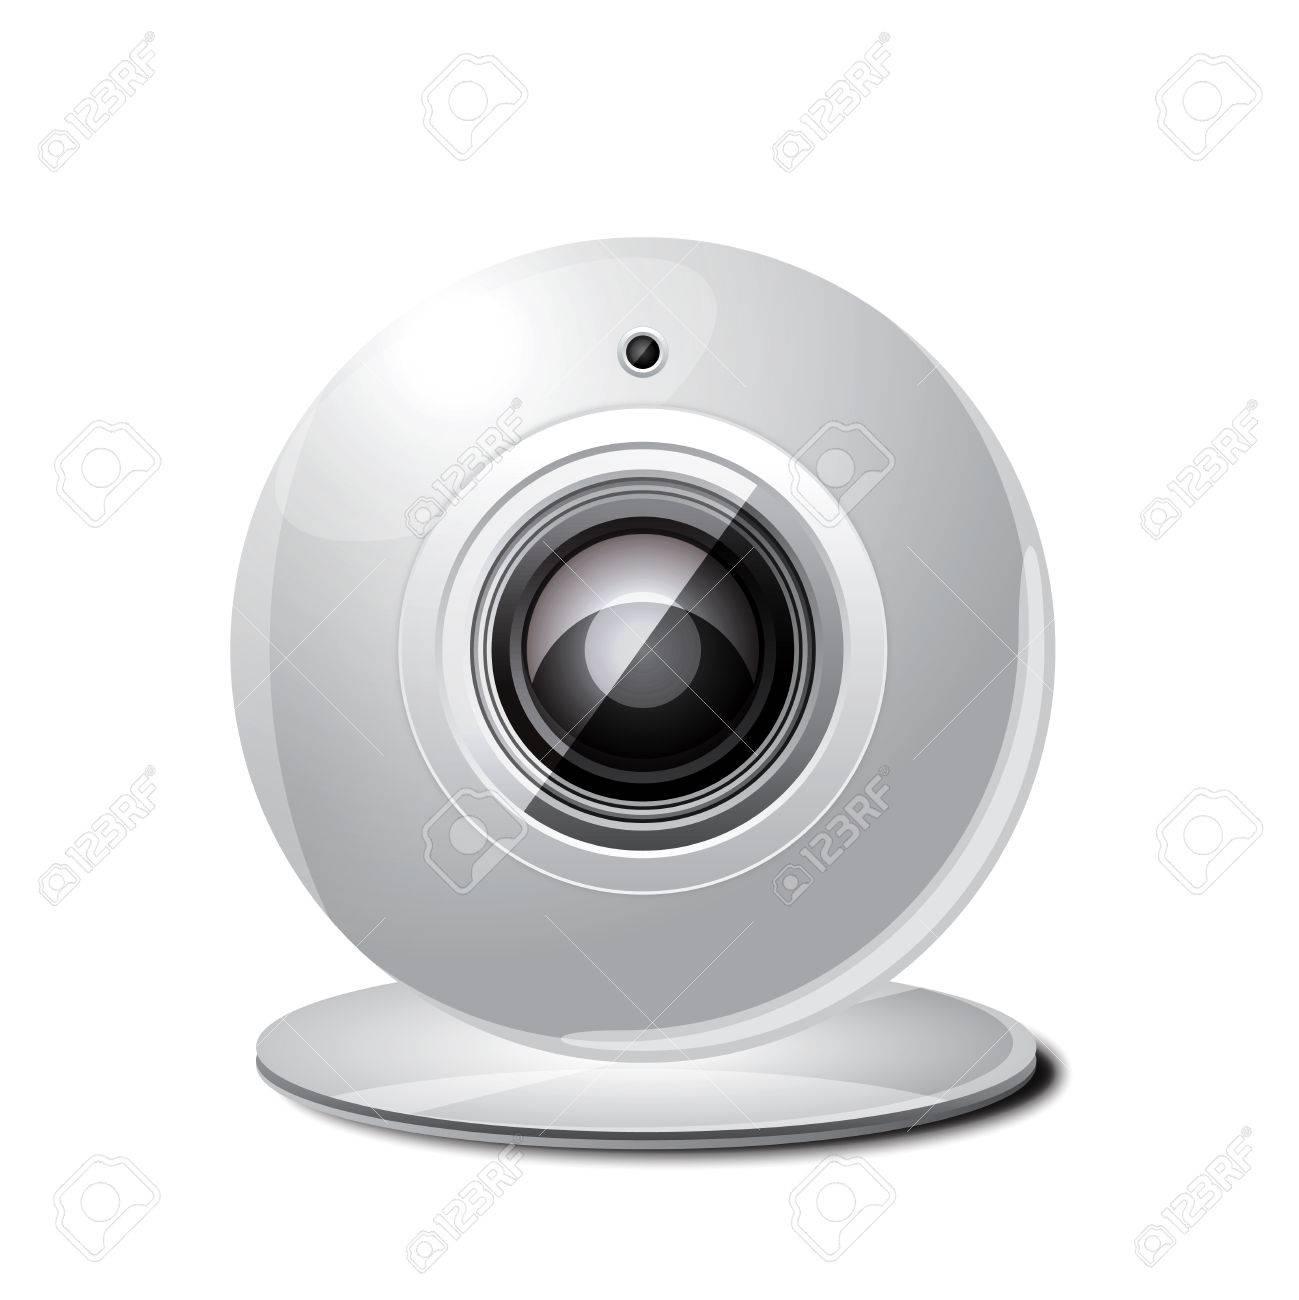 web カメラ ロイヤリティフリークリップアート、ベクター、ストック